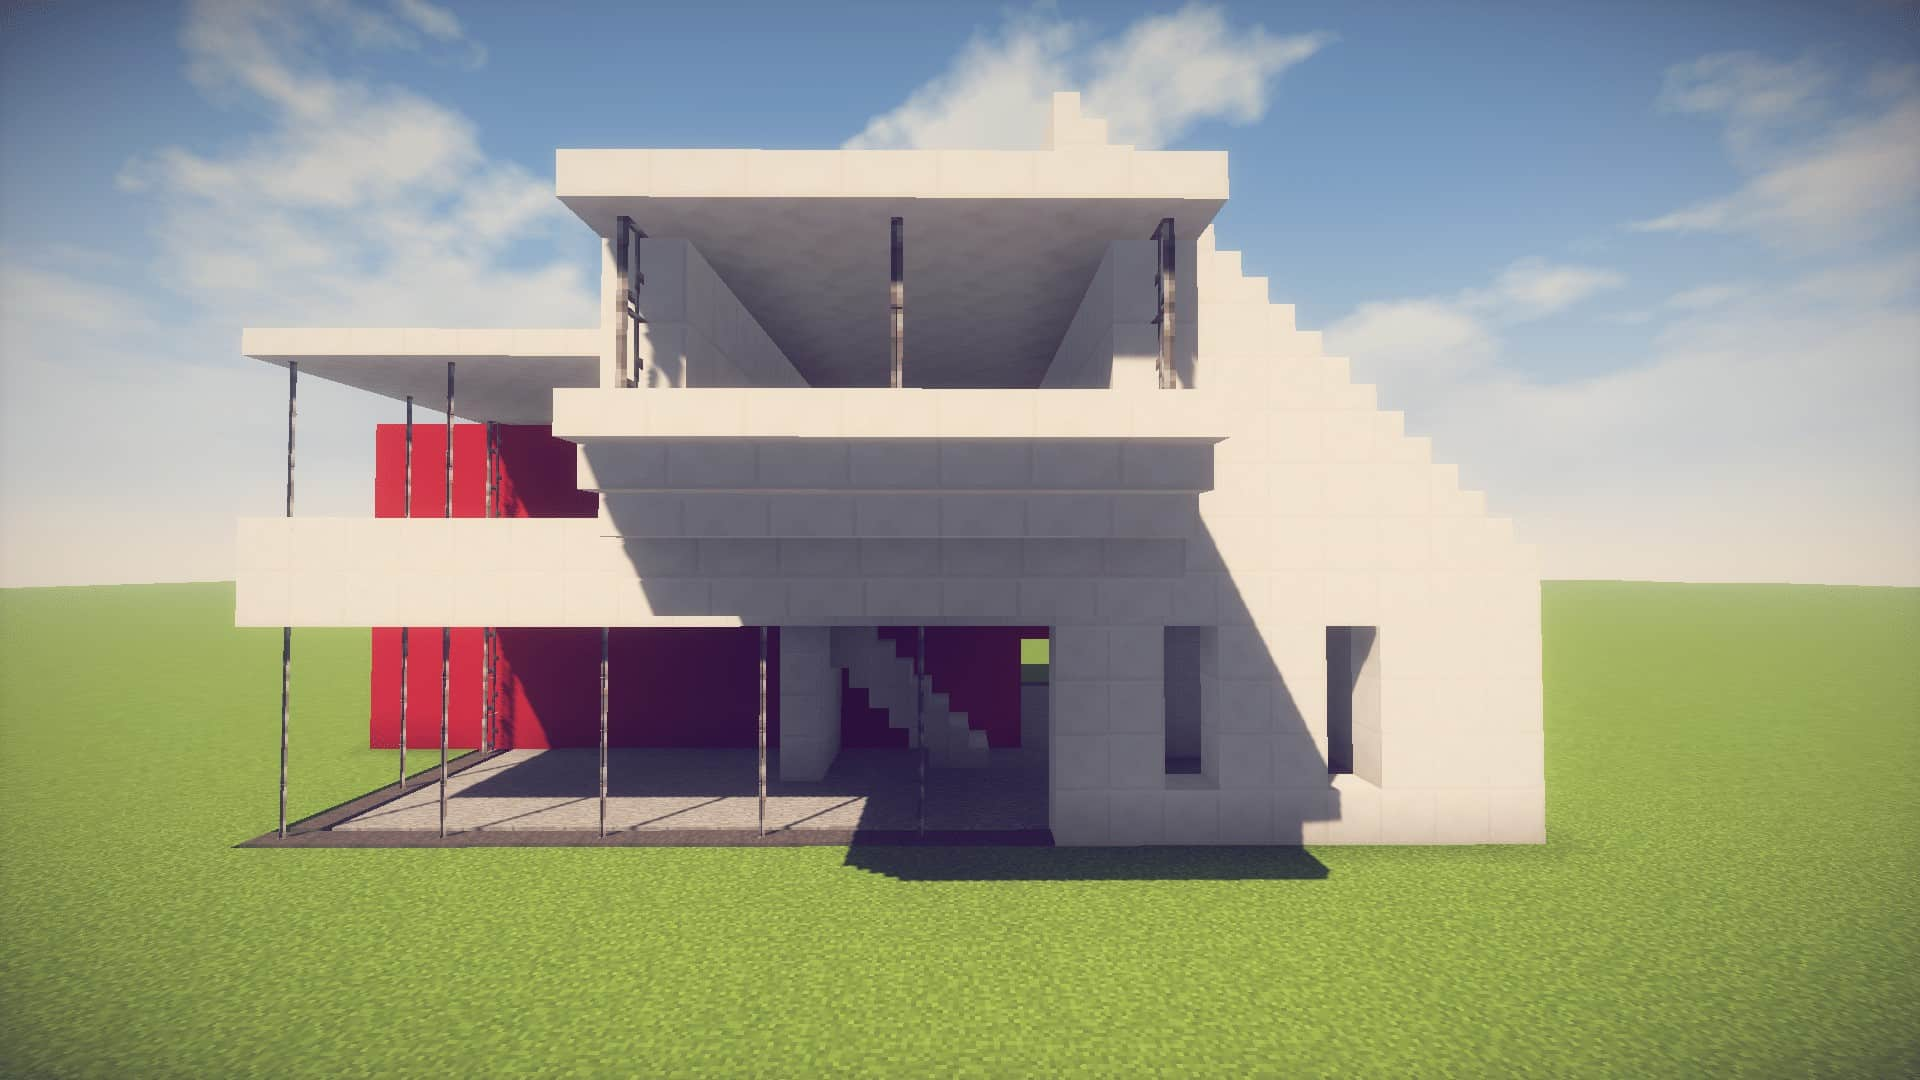 minecraft house tutorial - HD1920×1080